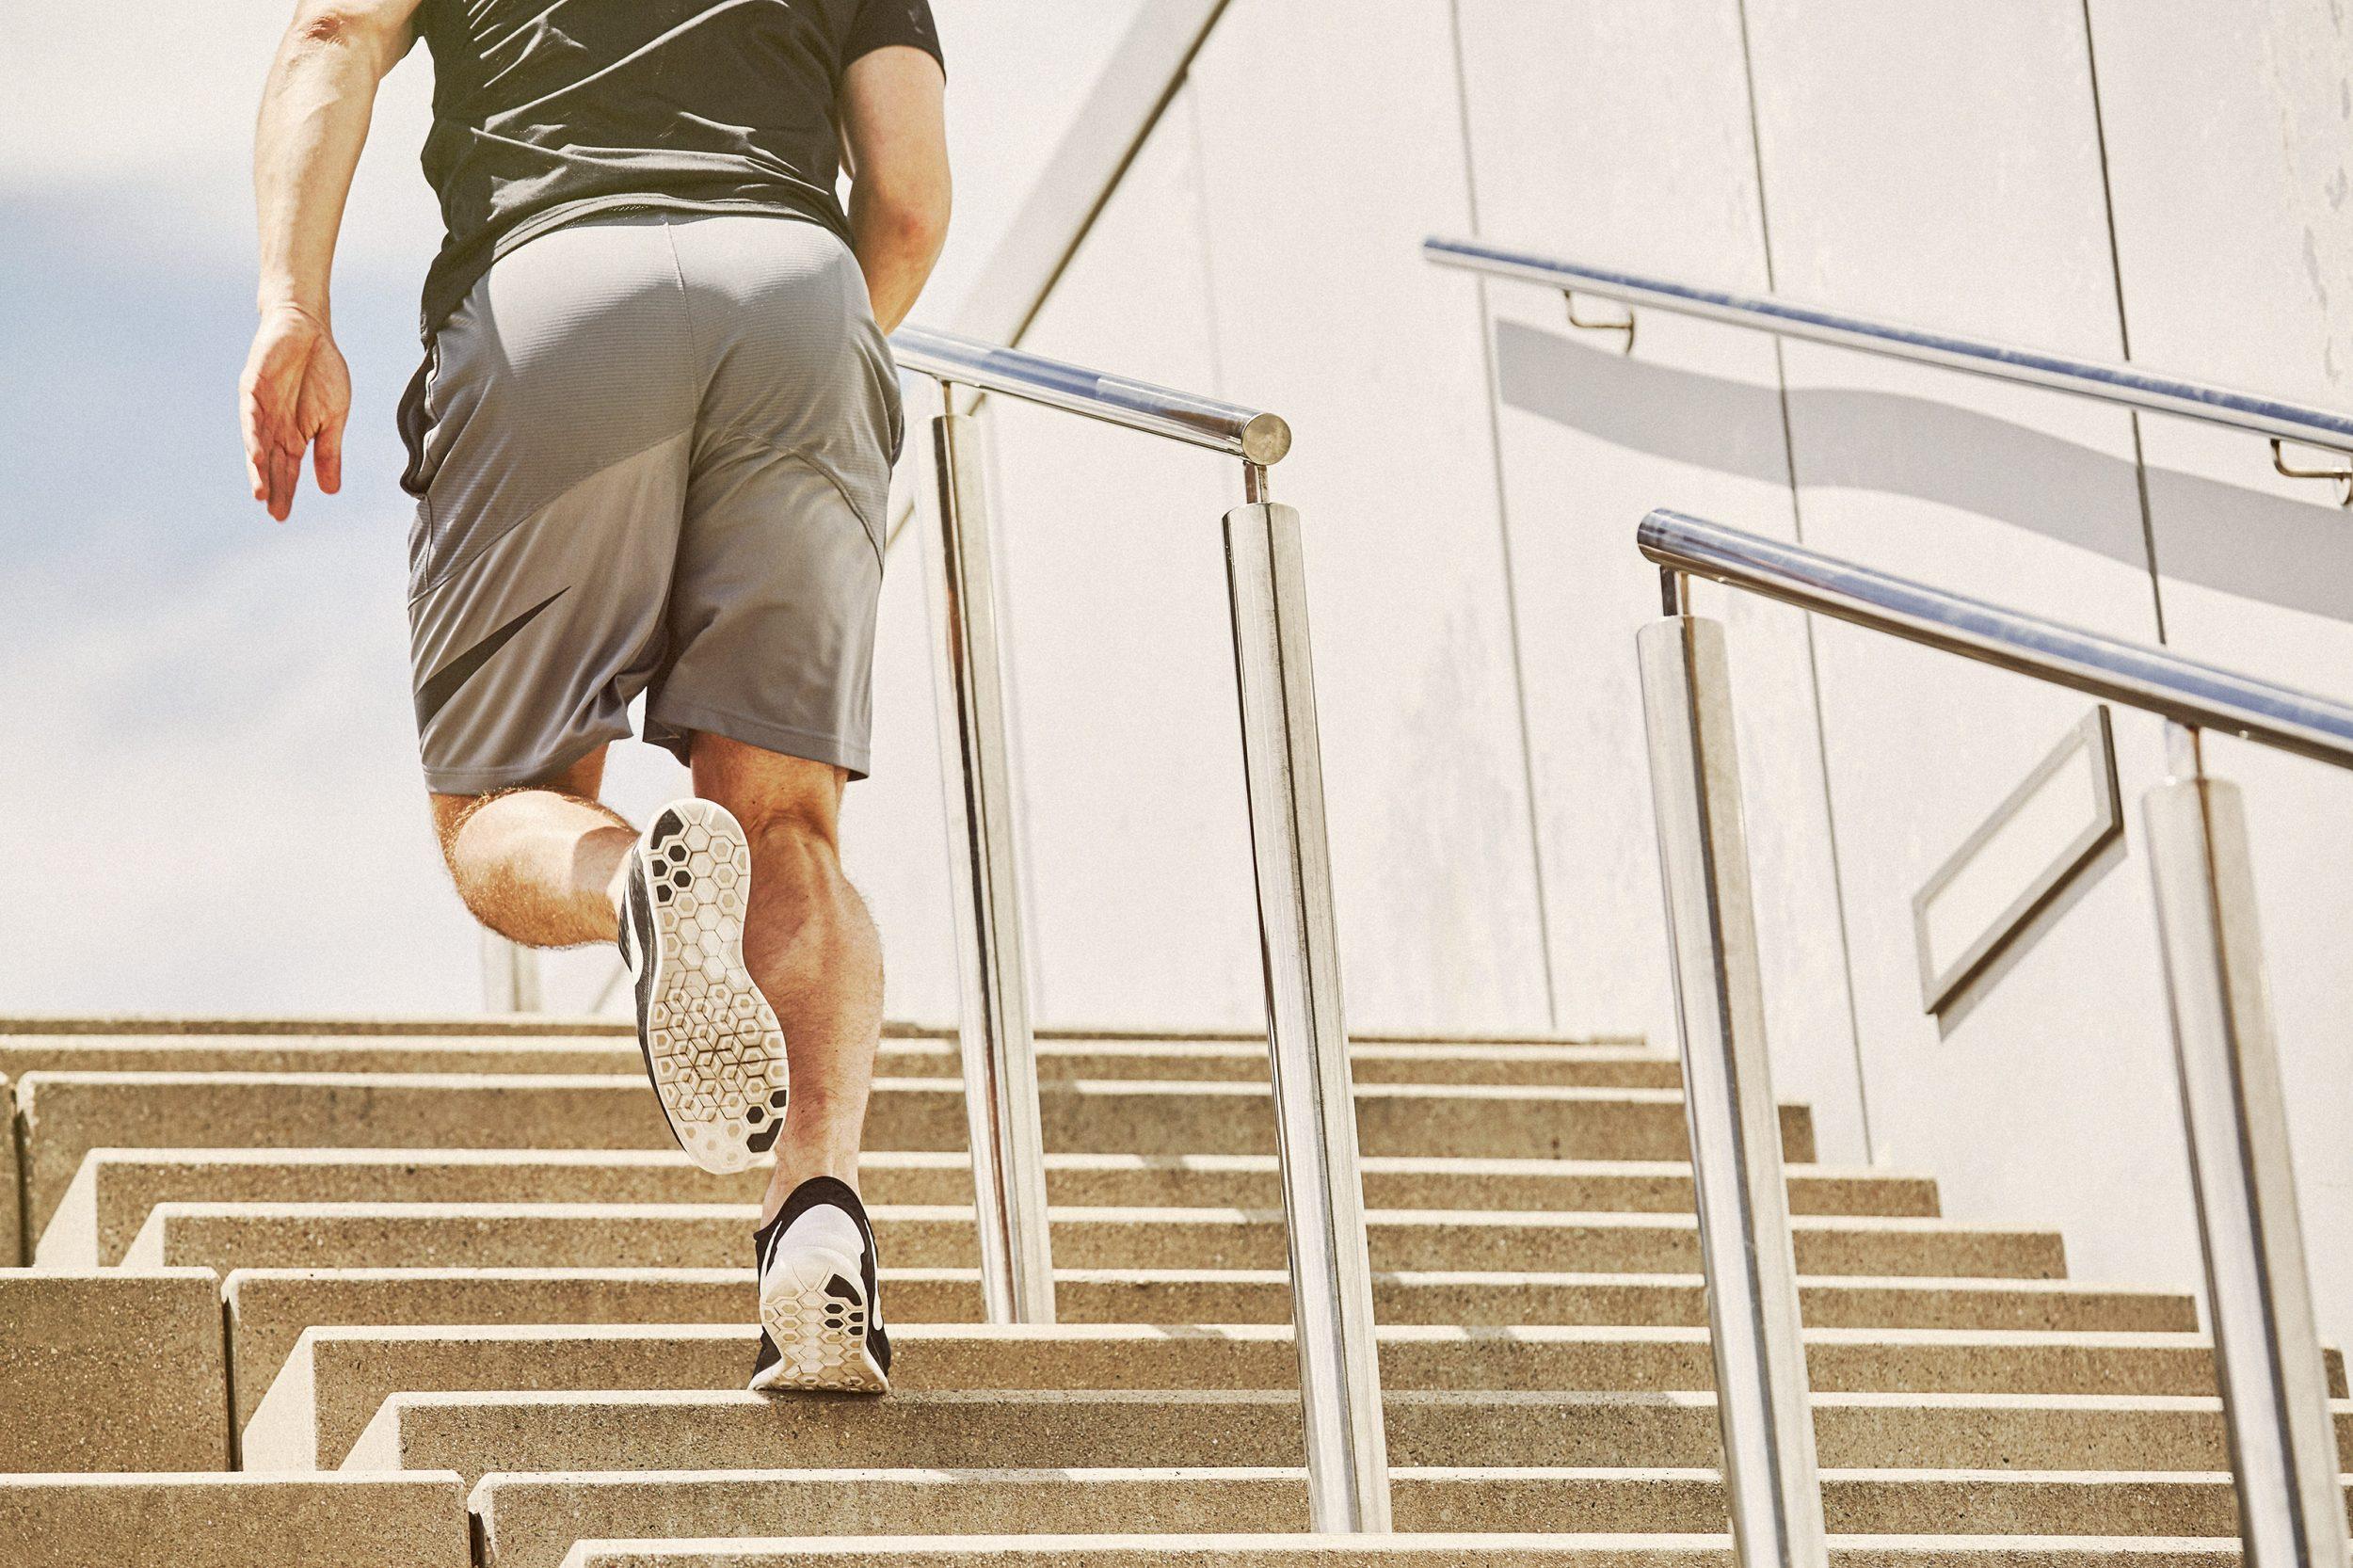 athlete doing stair training